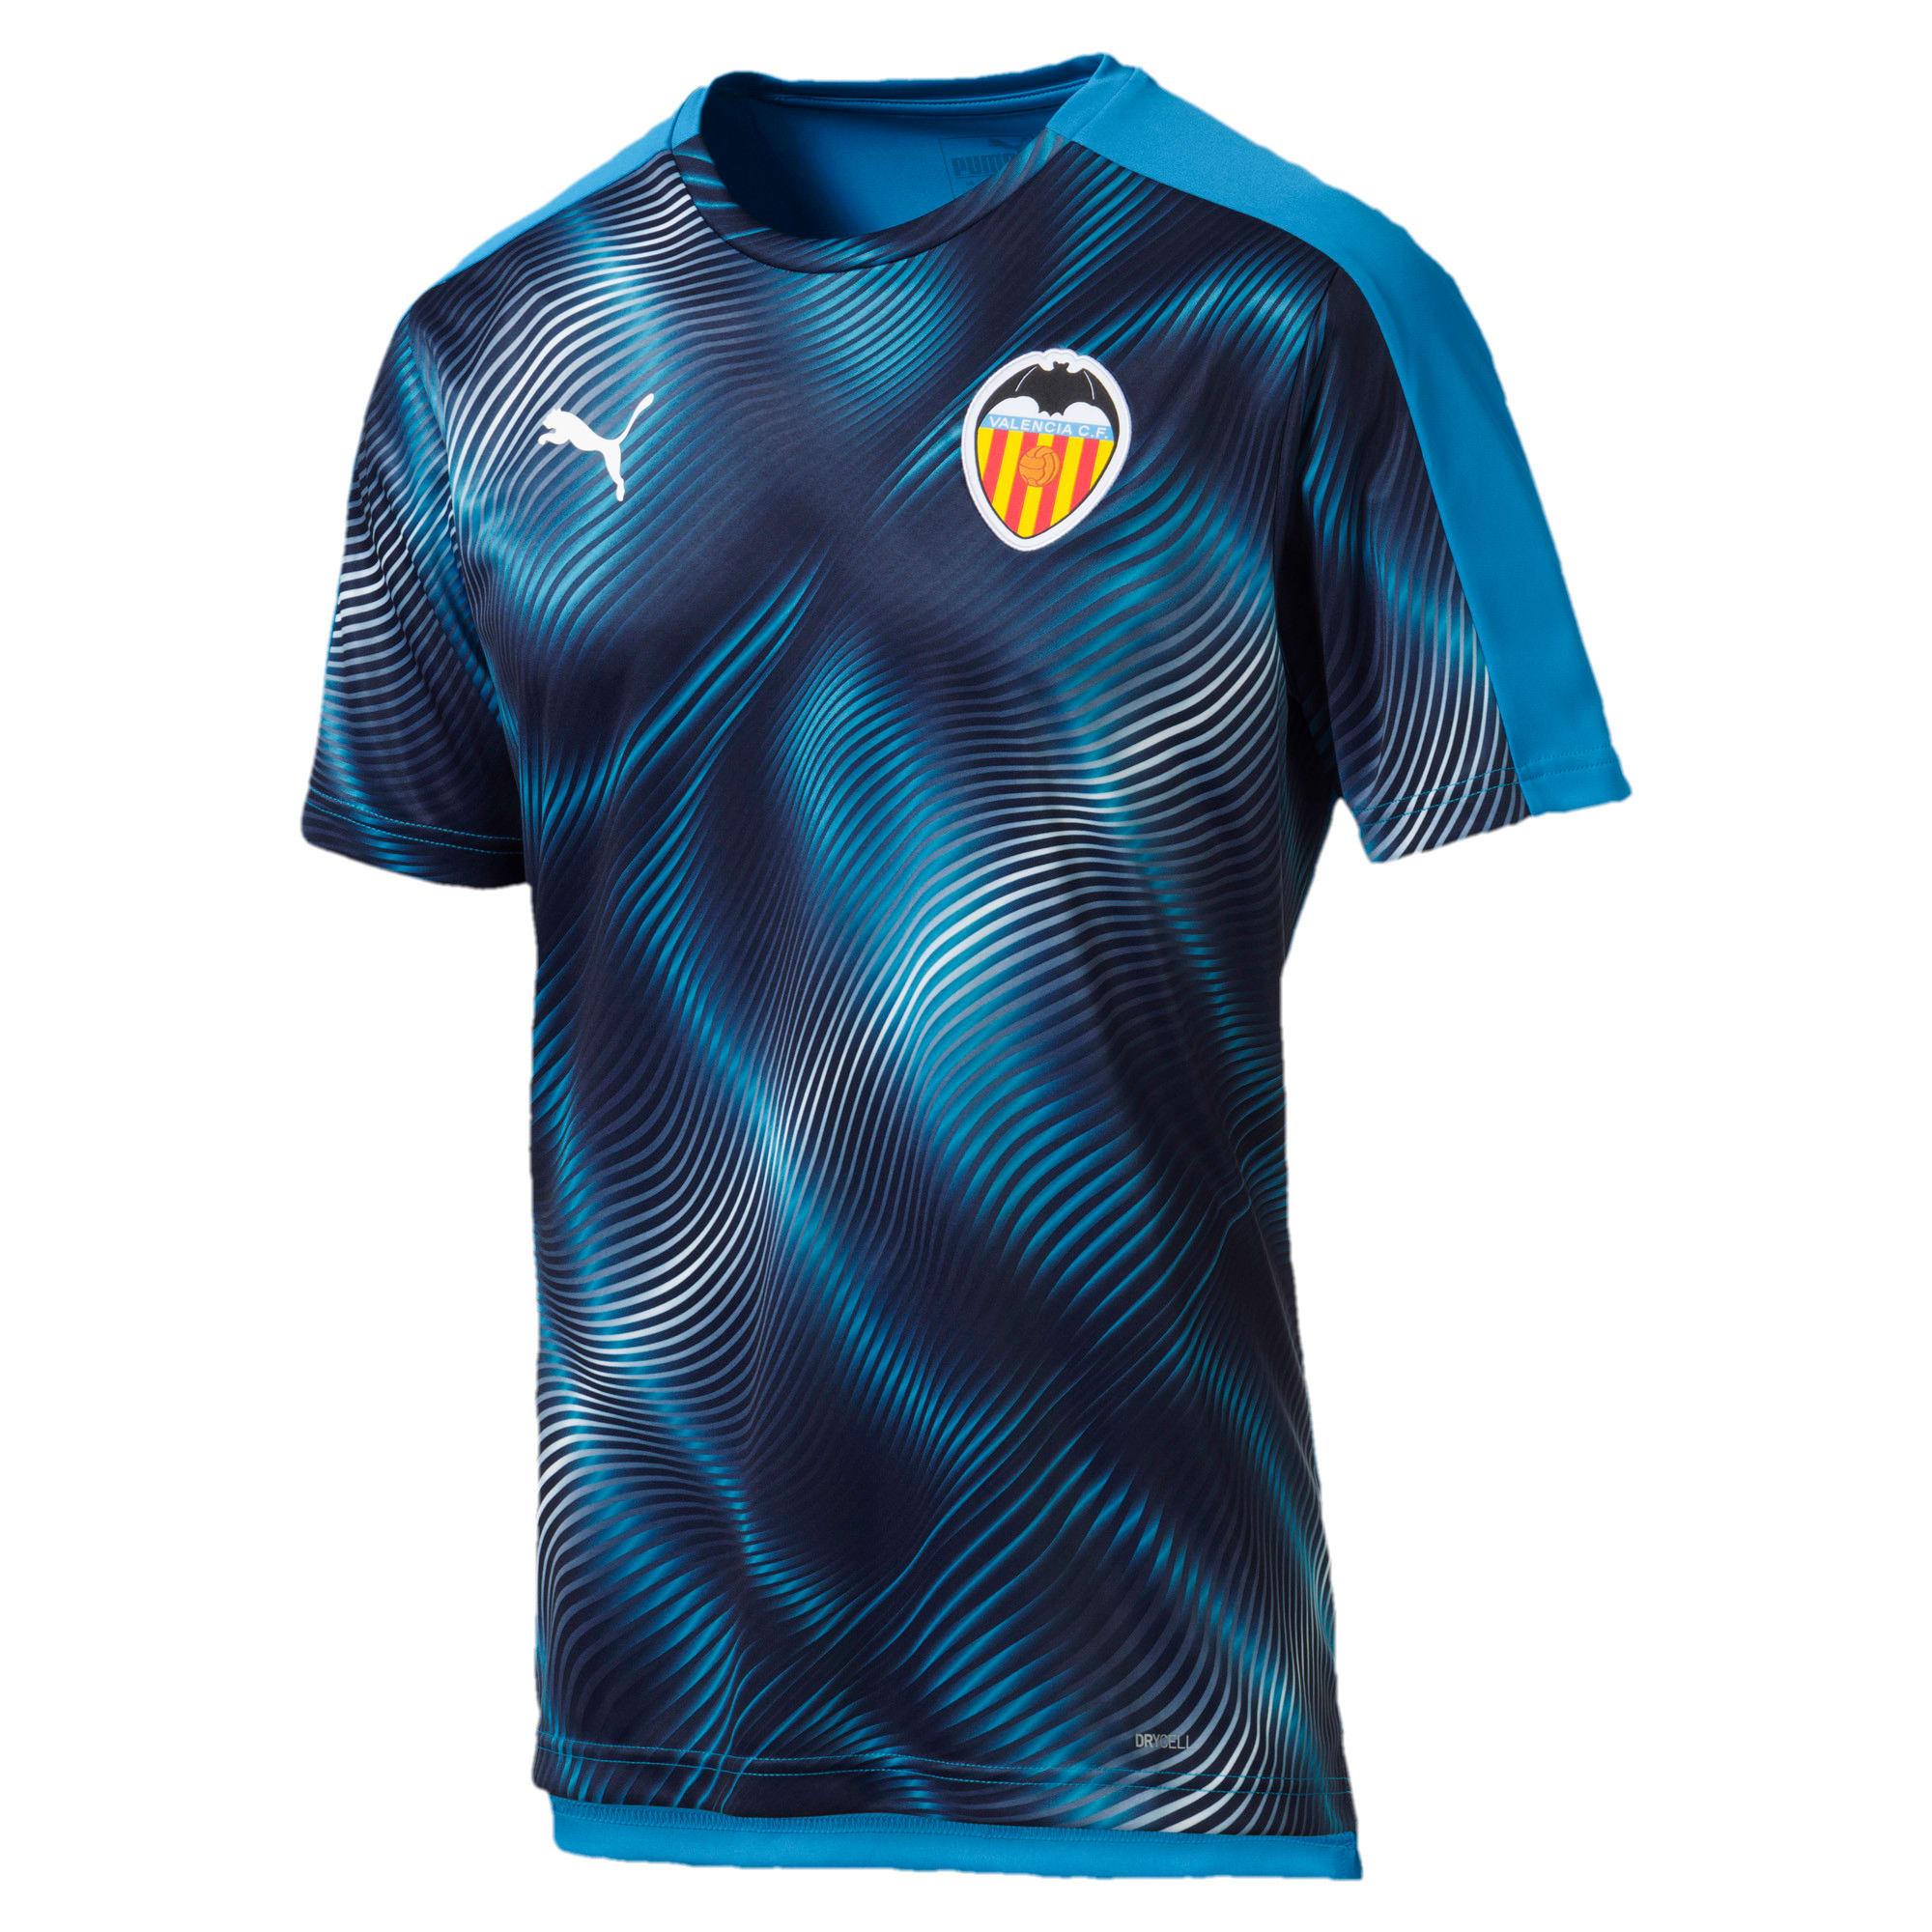 Thumbnail 1 van Valencia CF stadionshirt voor mannen, Bleu Azur-Peacoat, medium